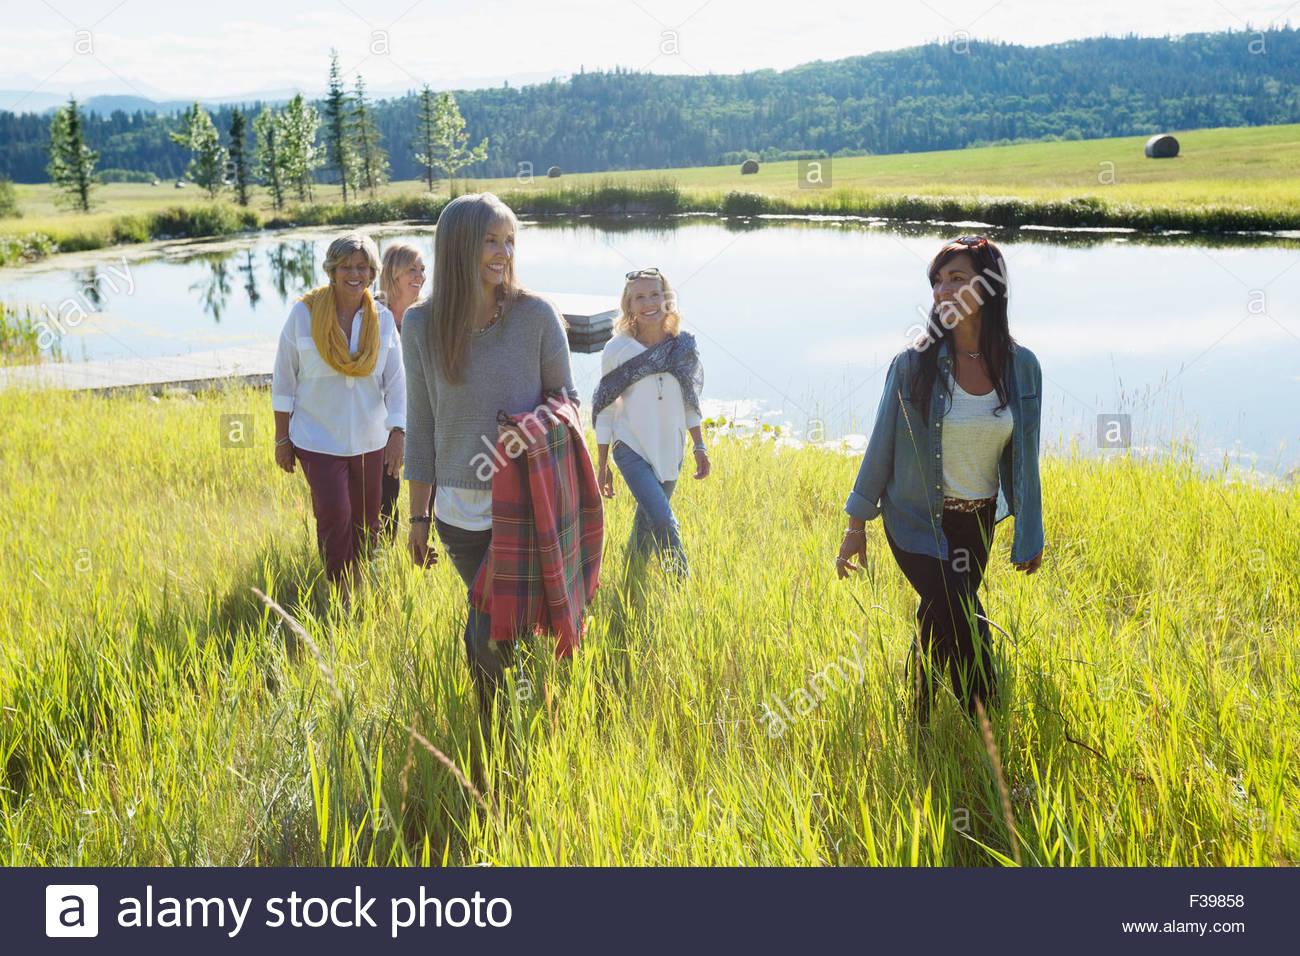 Women walking in sunny grass along lake - Stock Image